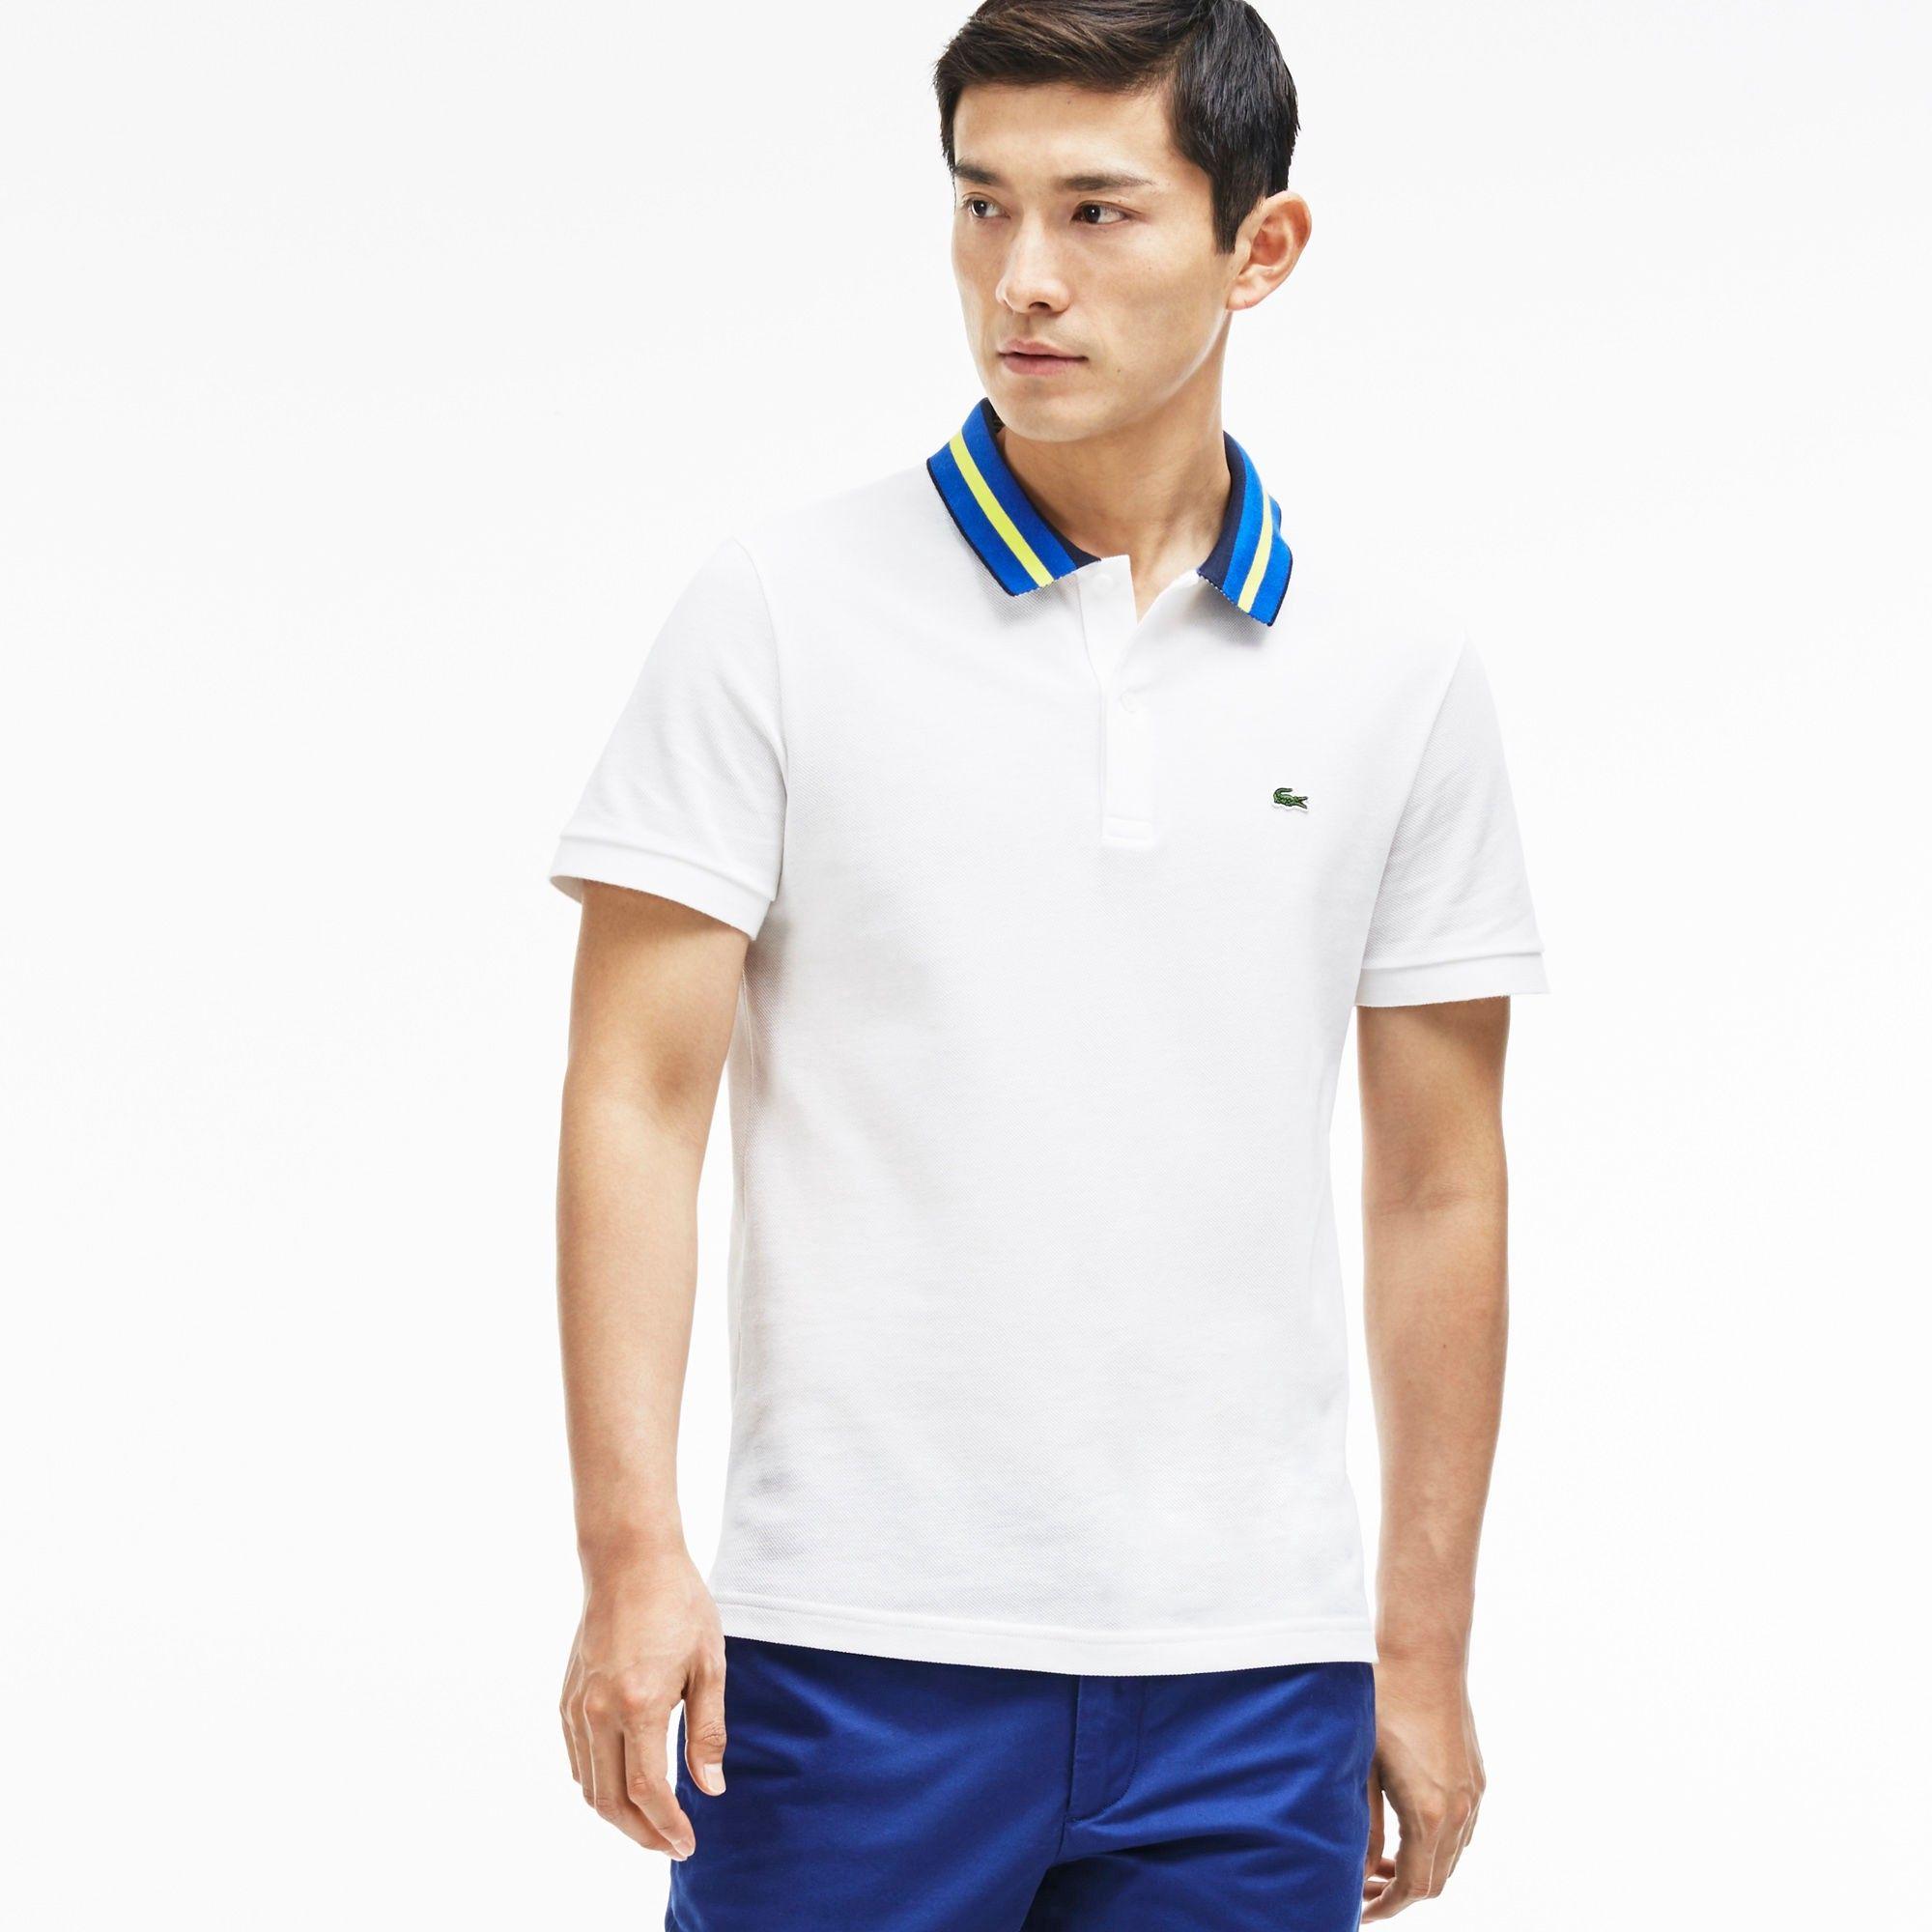 ef698c5ac White Lacoste Polo Shirts